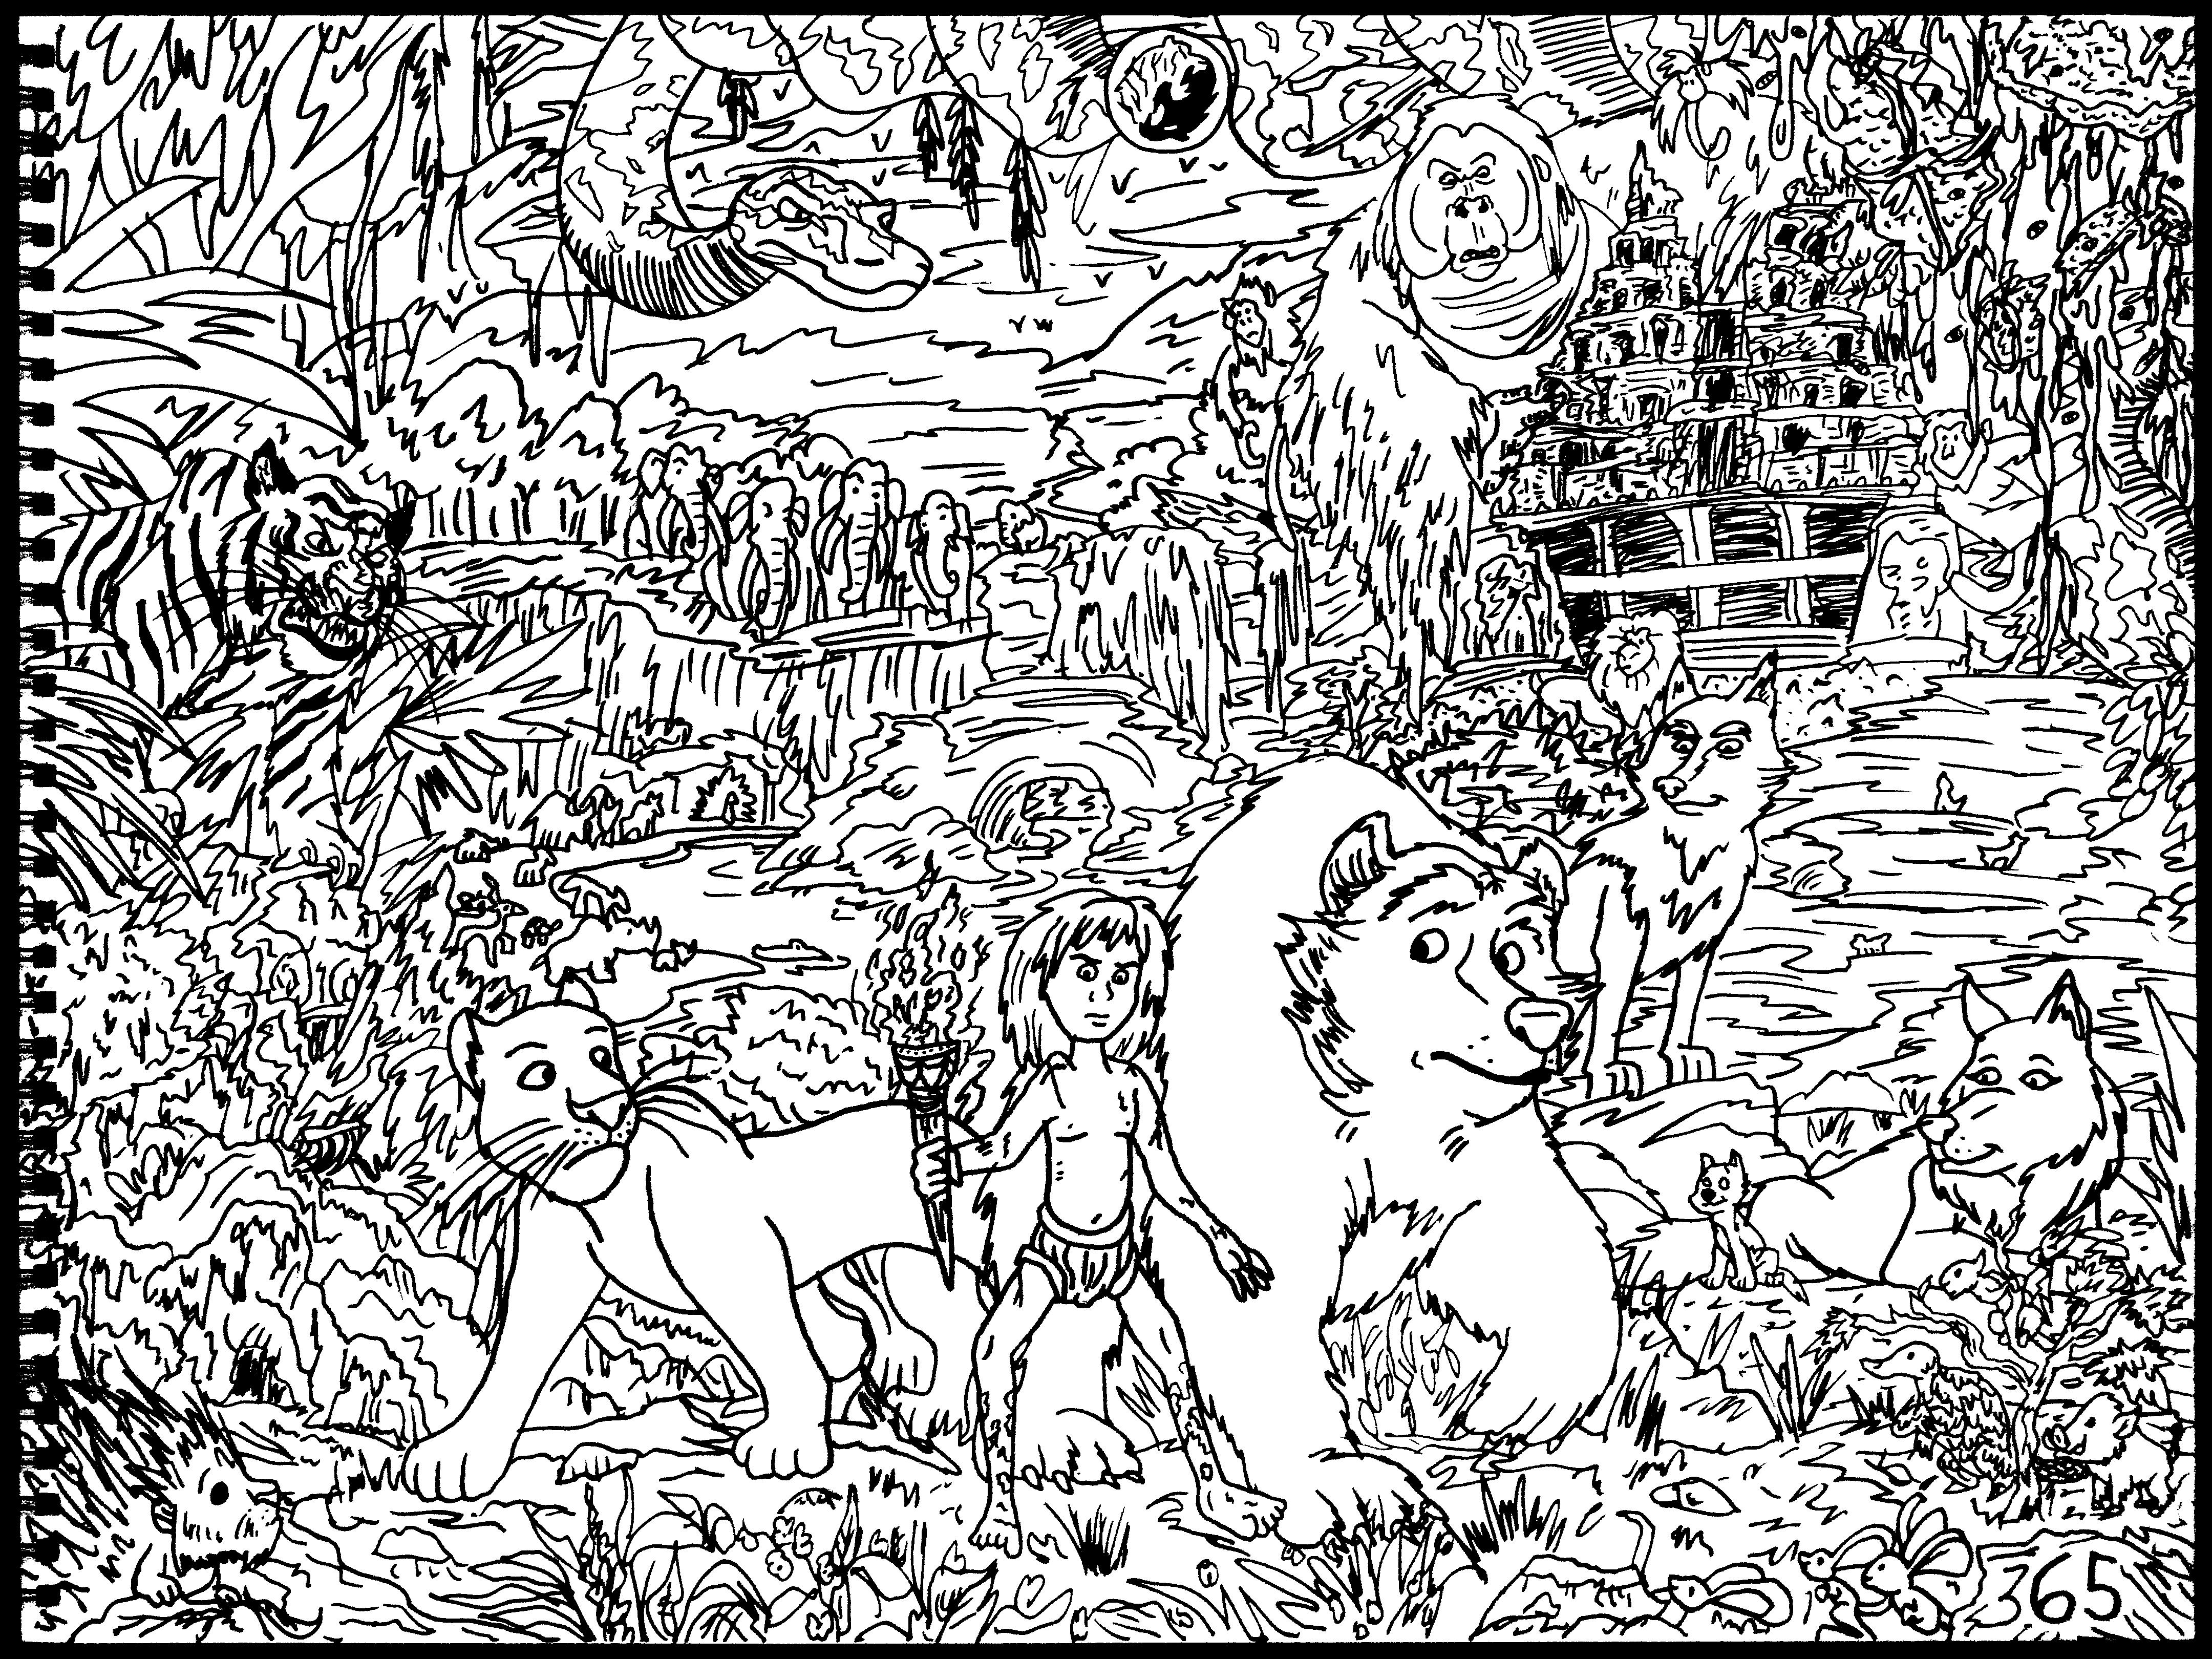 The Jungle Book 2016 Film By Averagejoeartwork On Deviantart